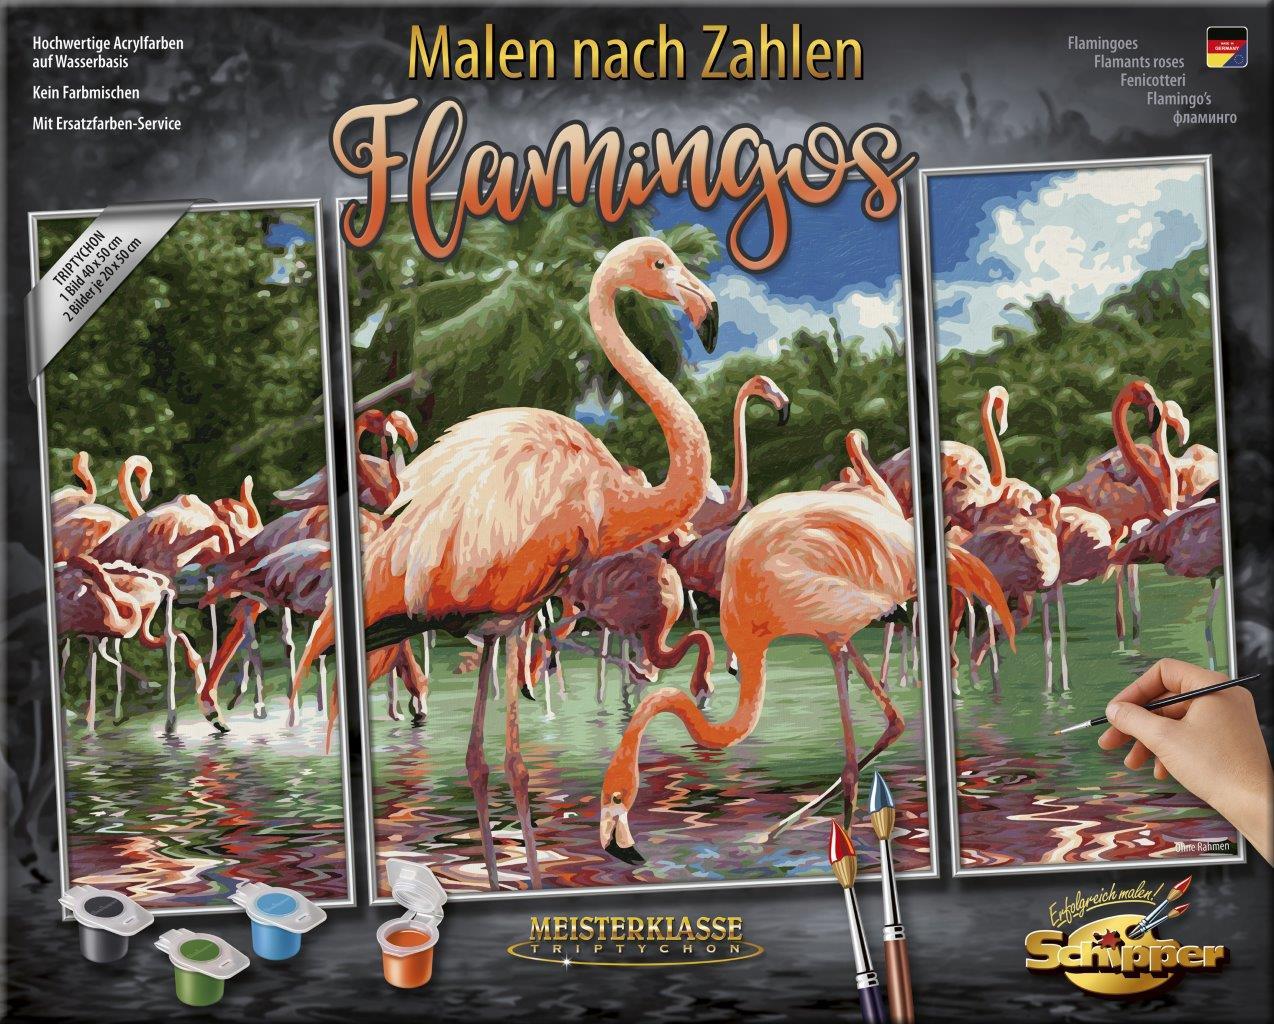 Malen nach Zahlen - Flamingos